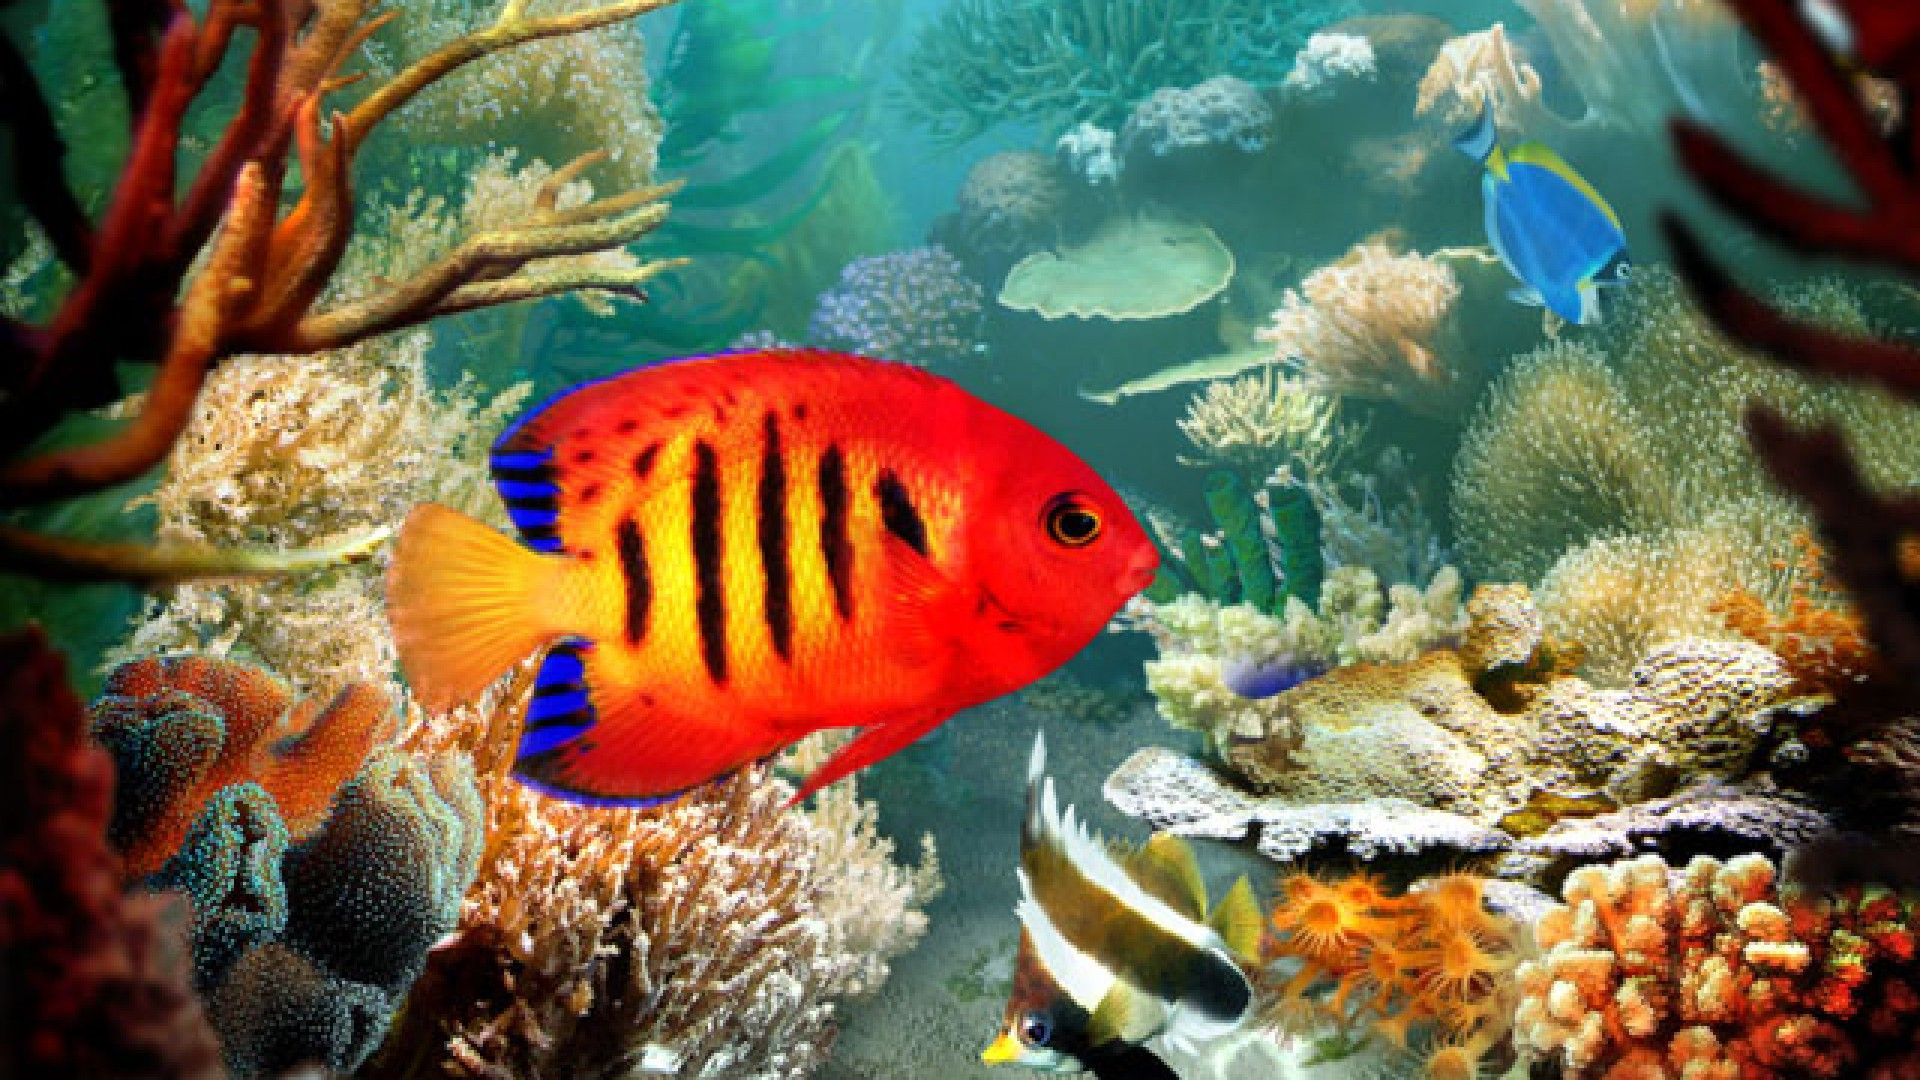 Homepage fish tropical fish 3d wallpaper tropical fish image search results for aquarium fish publicscrutiny Images